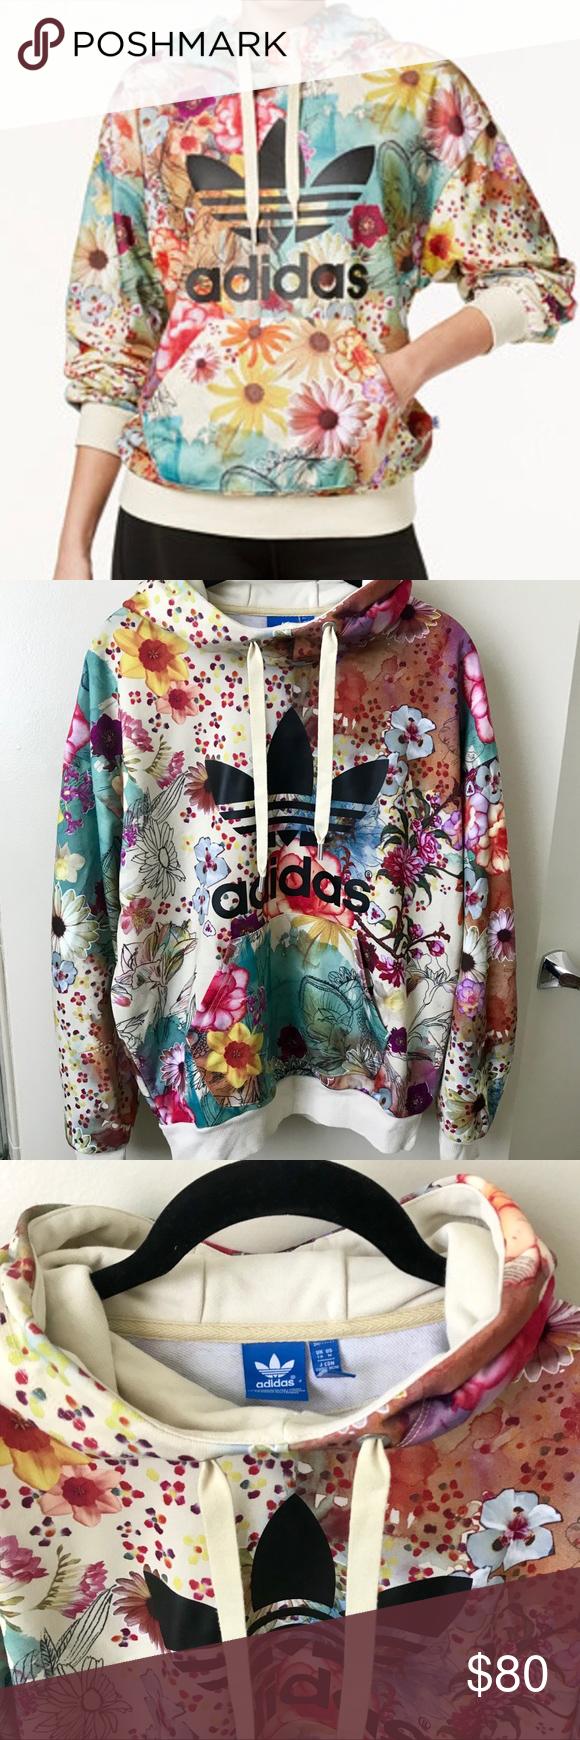 467faadf6615 Adidas Rare Farm Confete Trefoil Hoodie Sweatshirt Super comfy adidas  floral print pullover style sweatshirt.